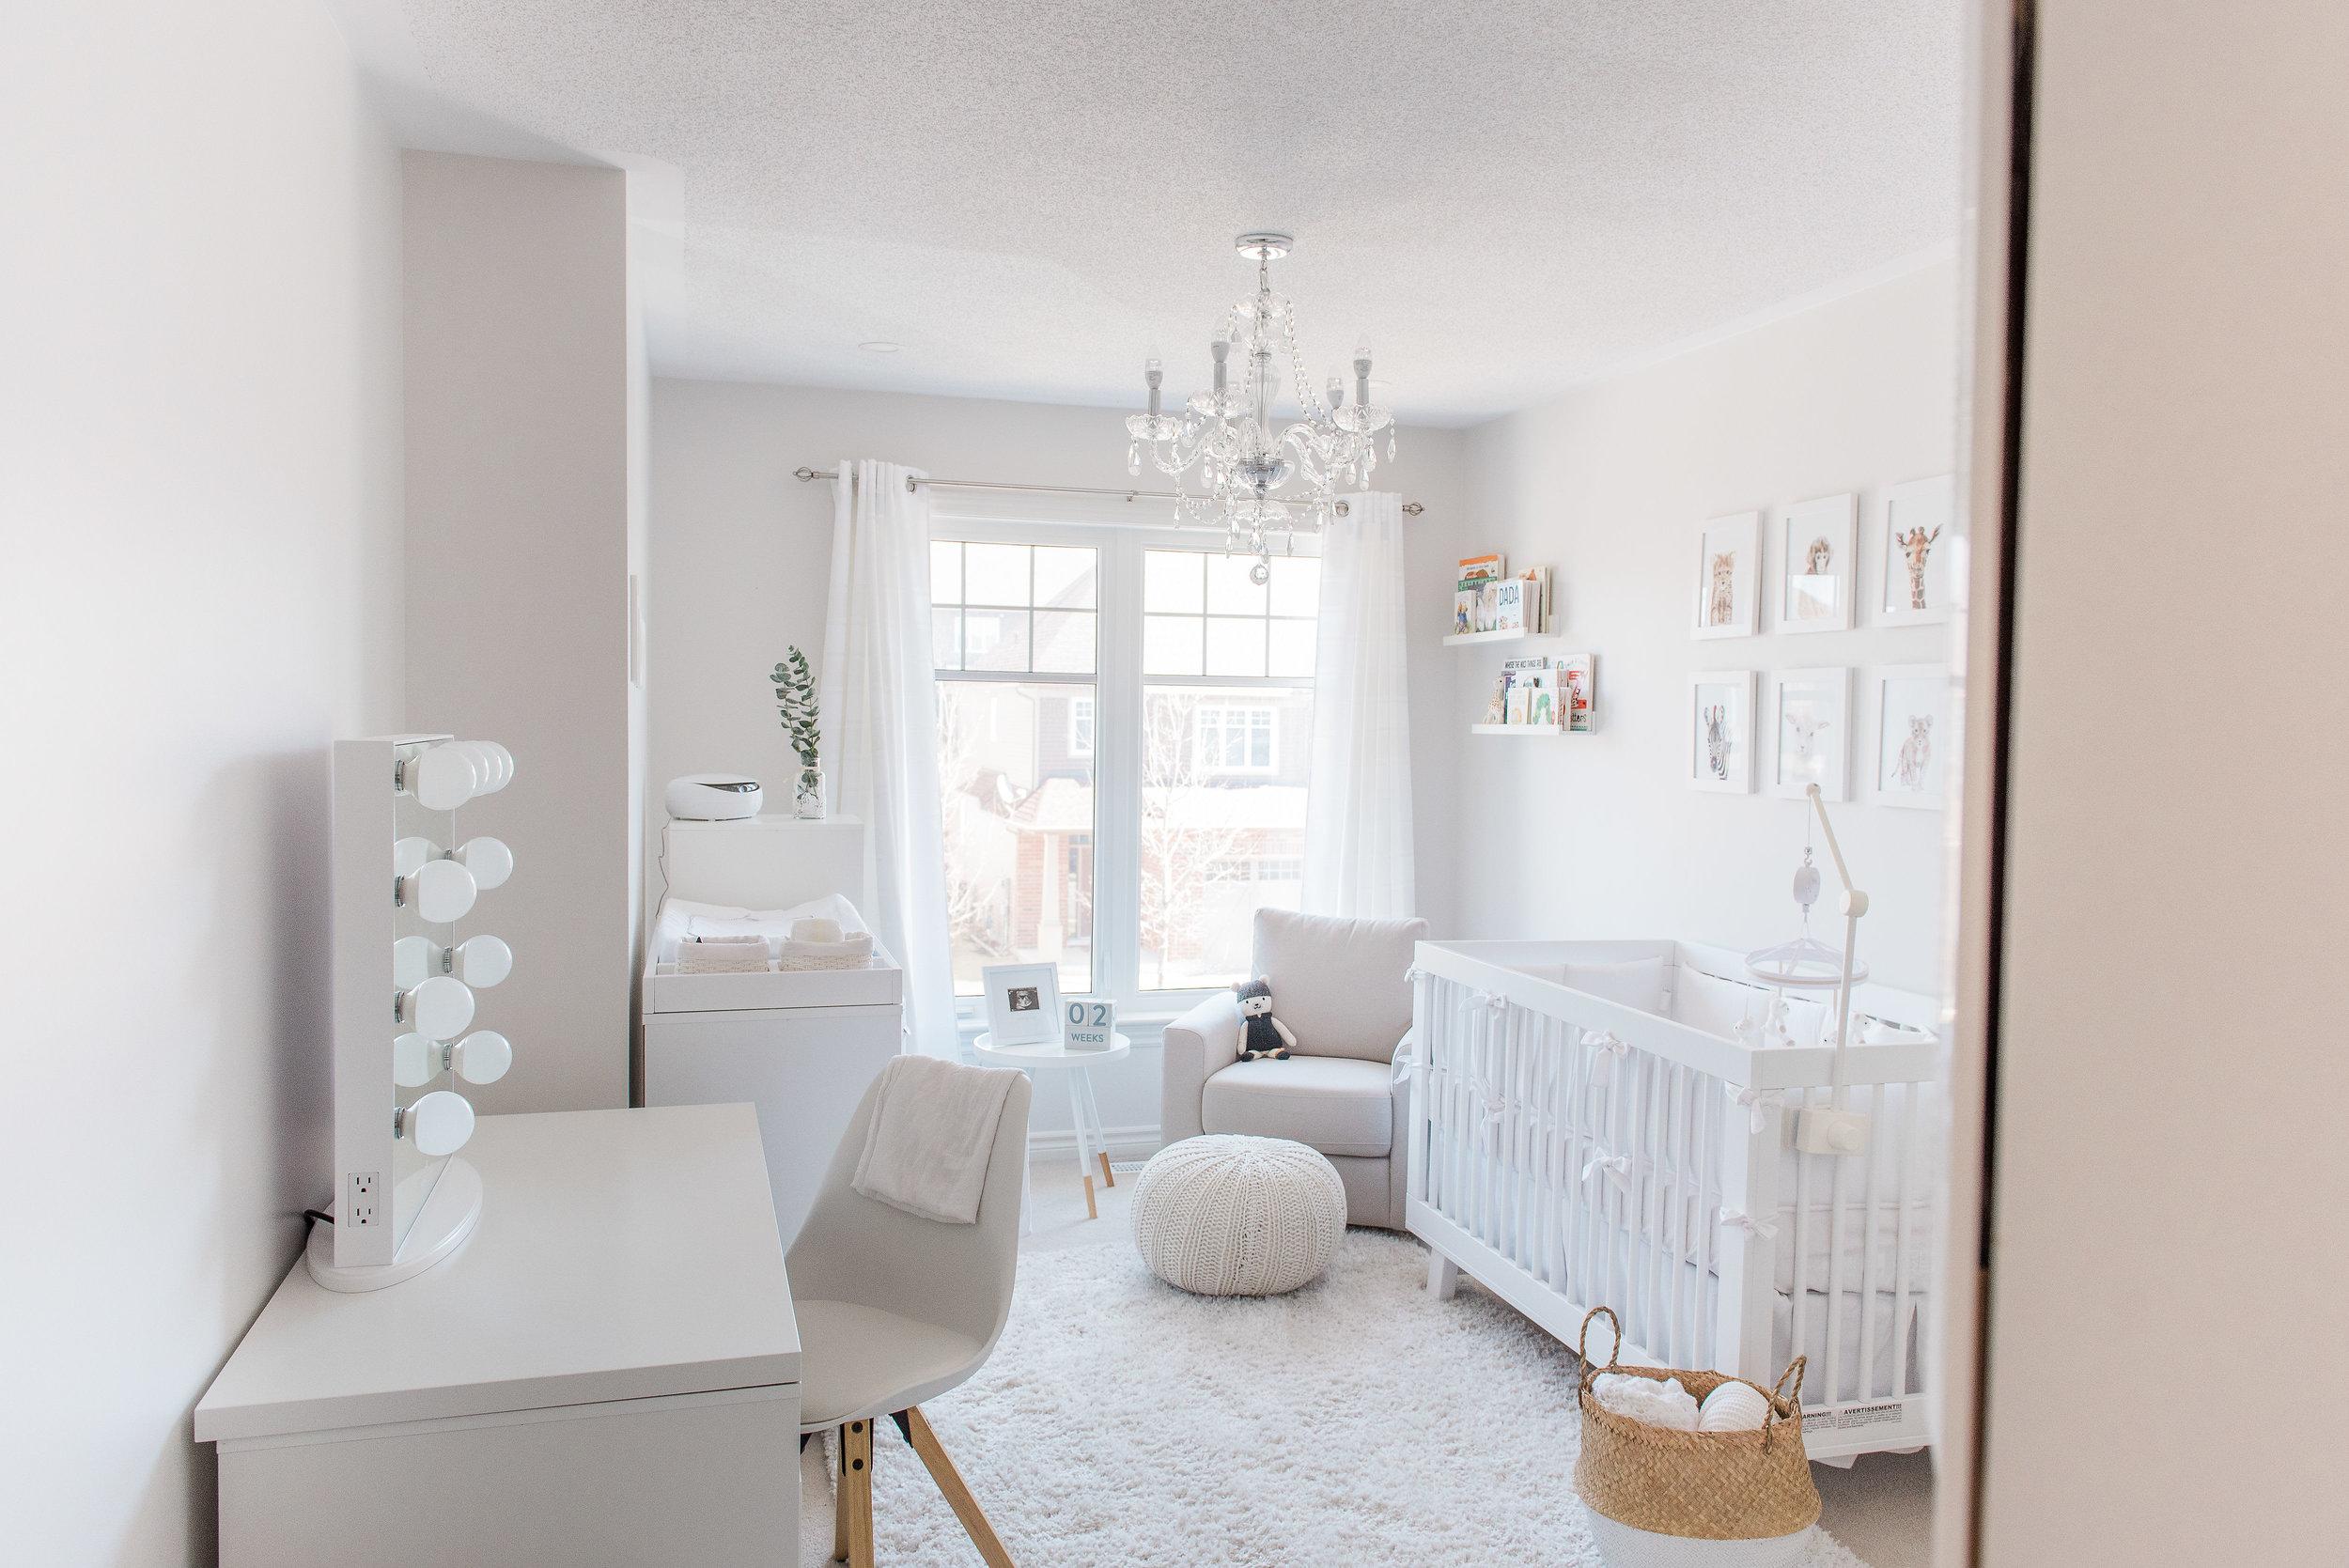 0003_Newborn_Lifestyle___All_White_Nursery_Baby_Boy___Hanan.jpg